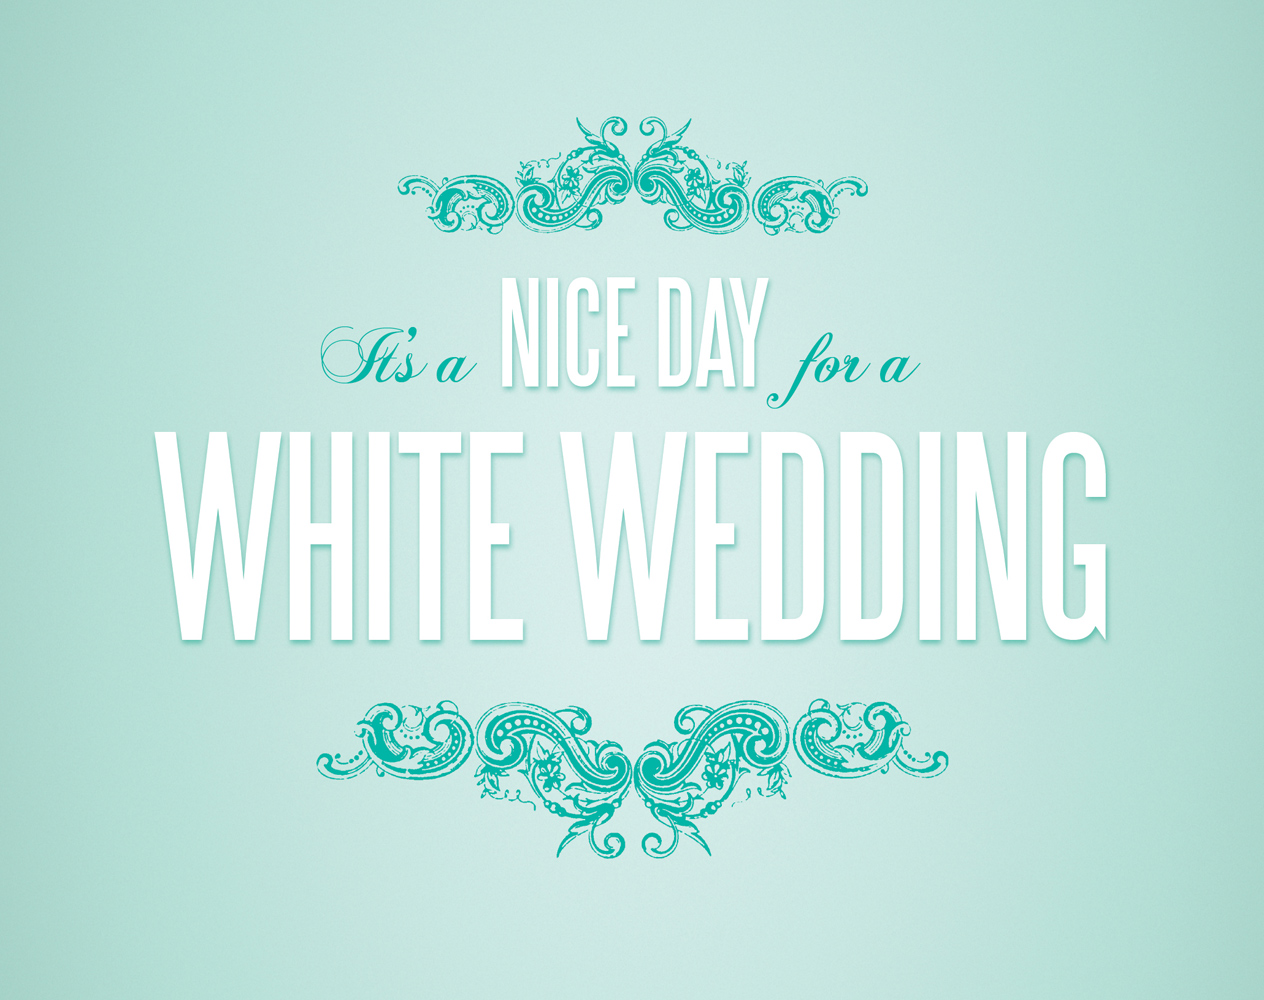 whitewed2w.jpg